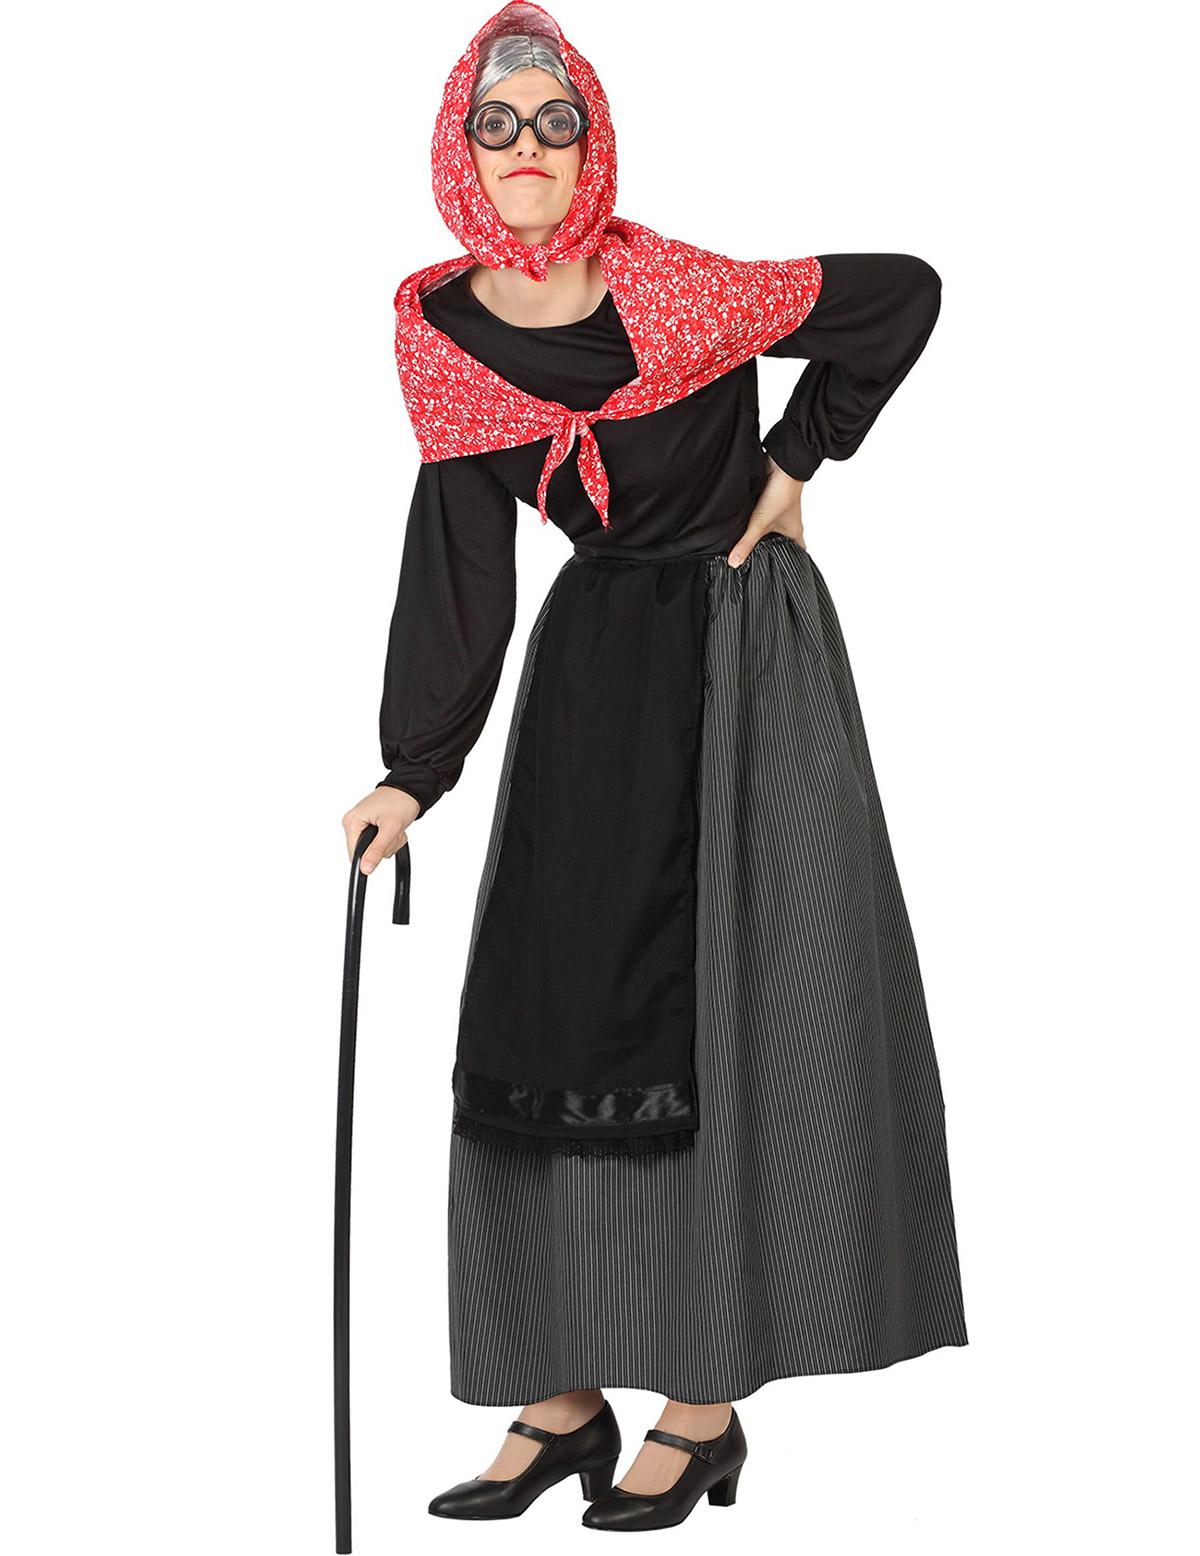 grappig oude vrouw carnavalskleding voor vegaoo nl